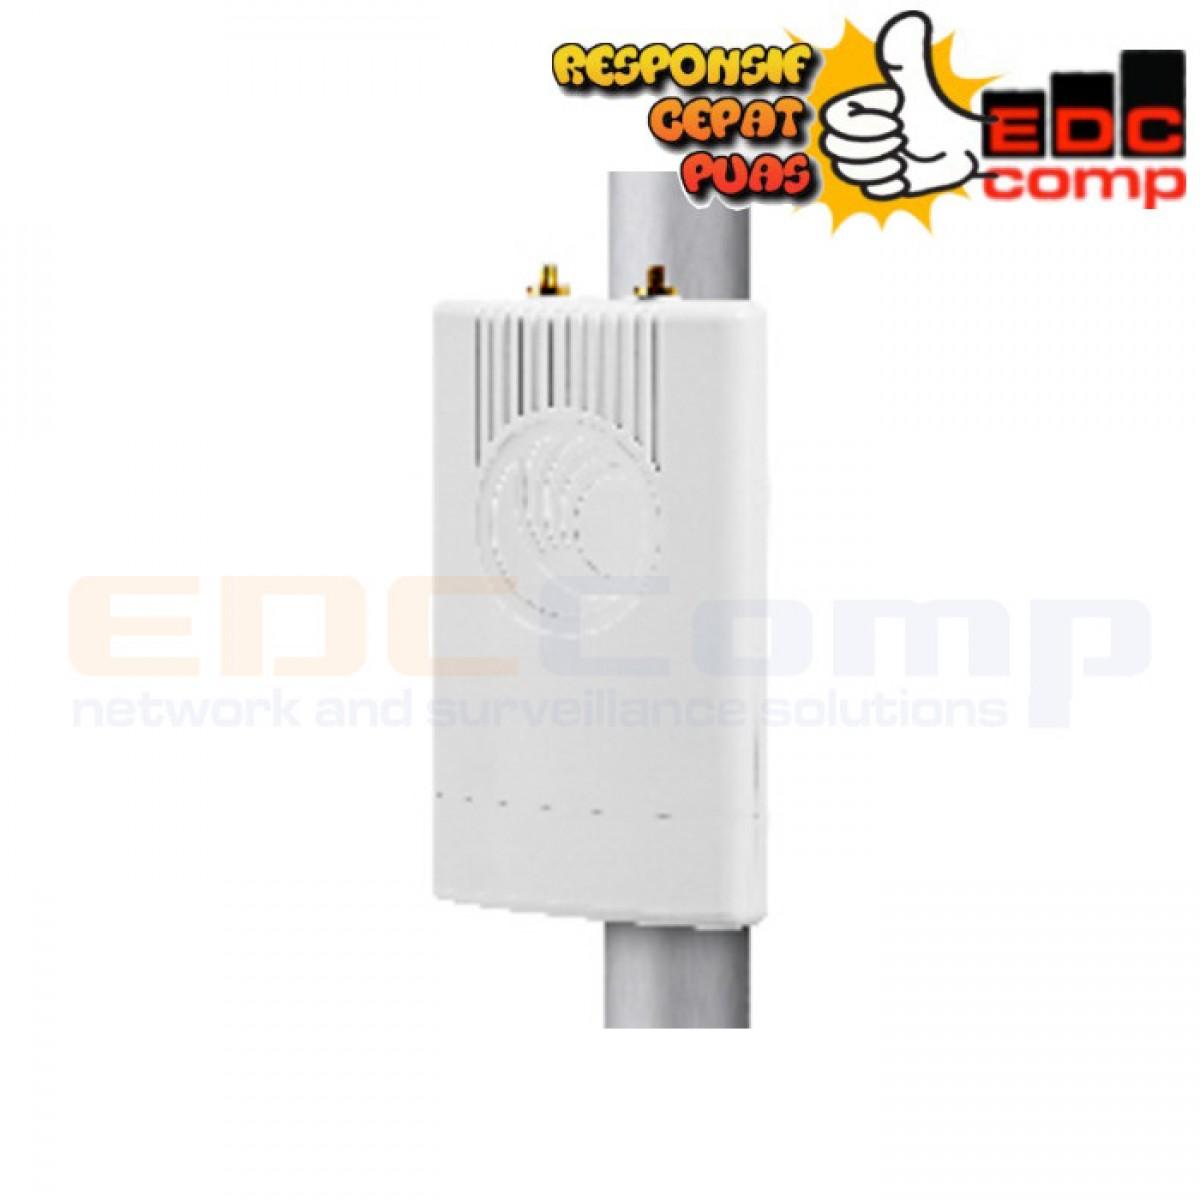 Cambium Networks ePMP2000 Access Point - EdcComp